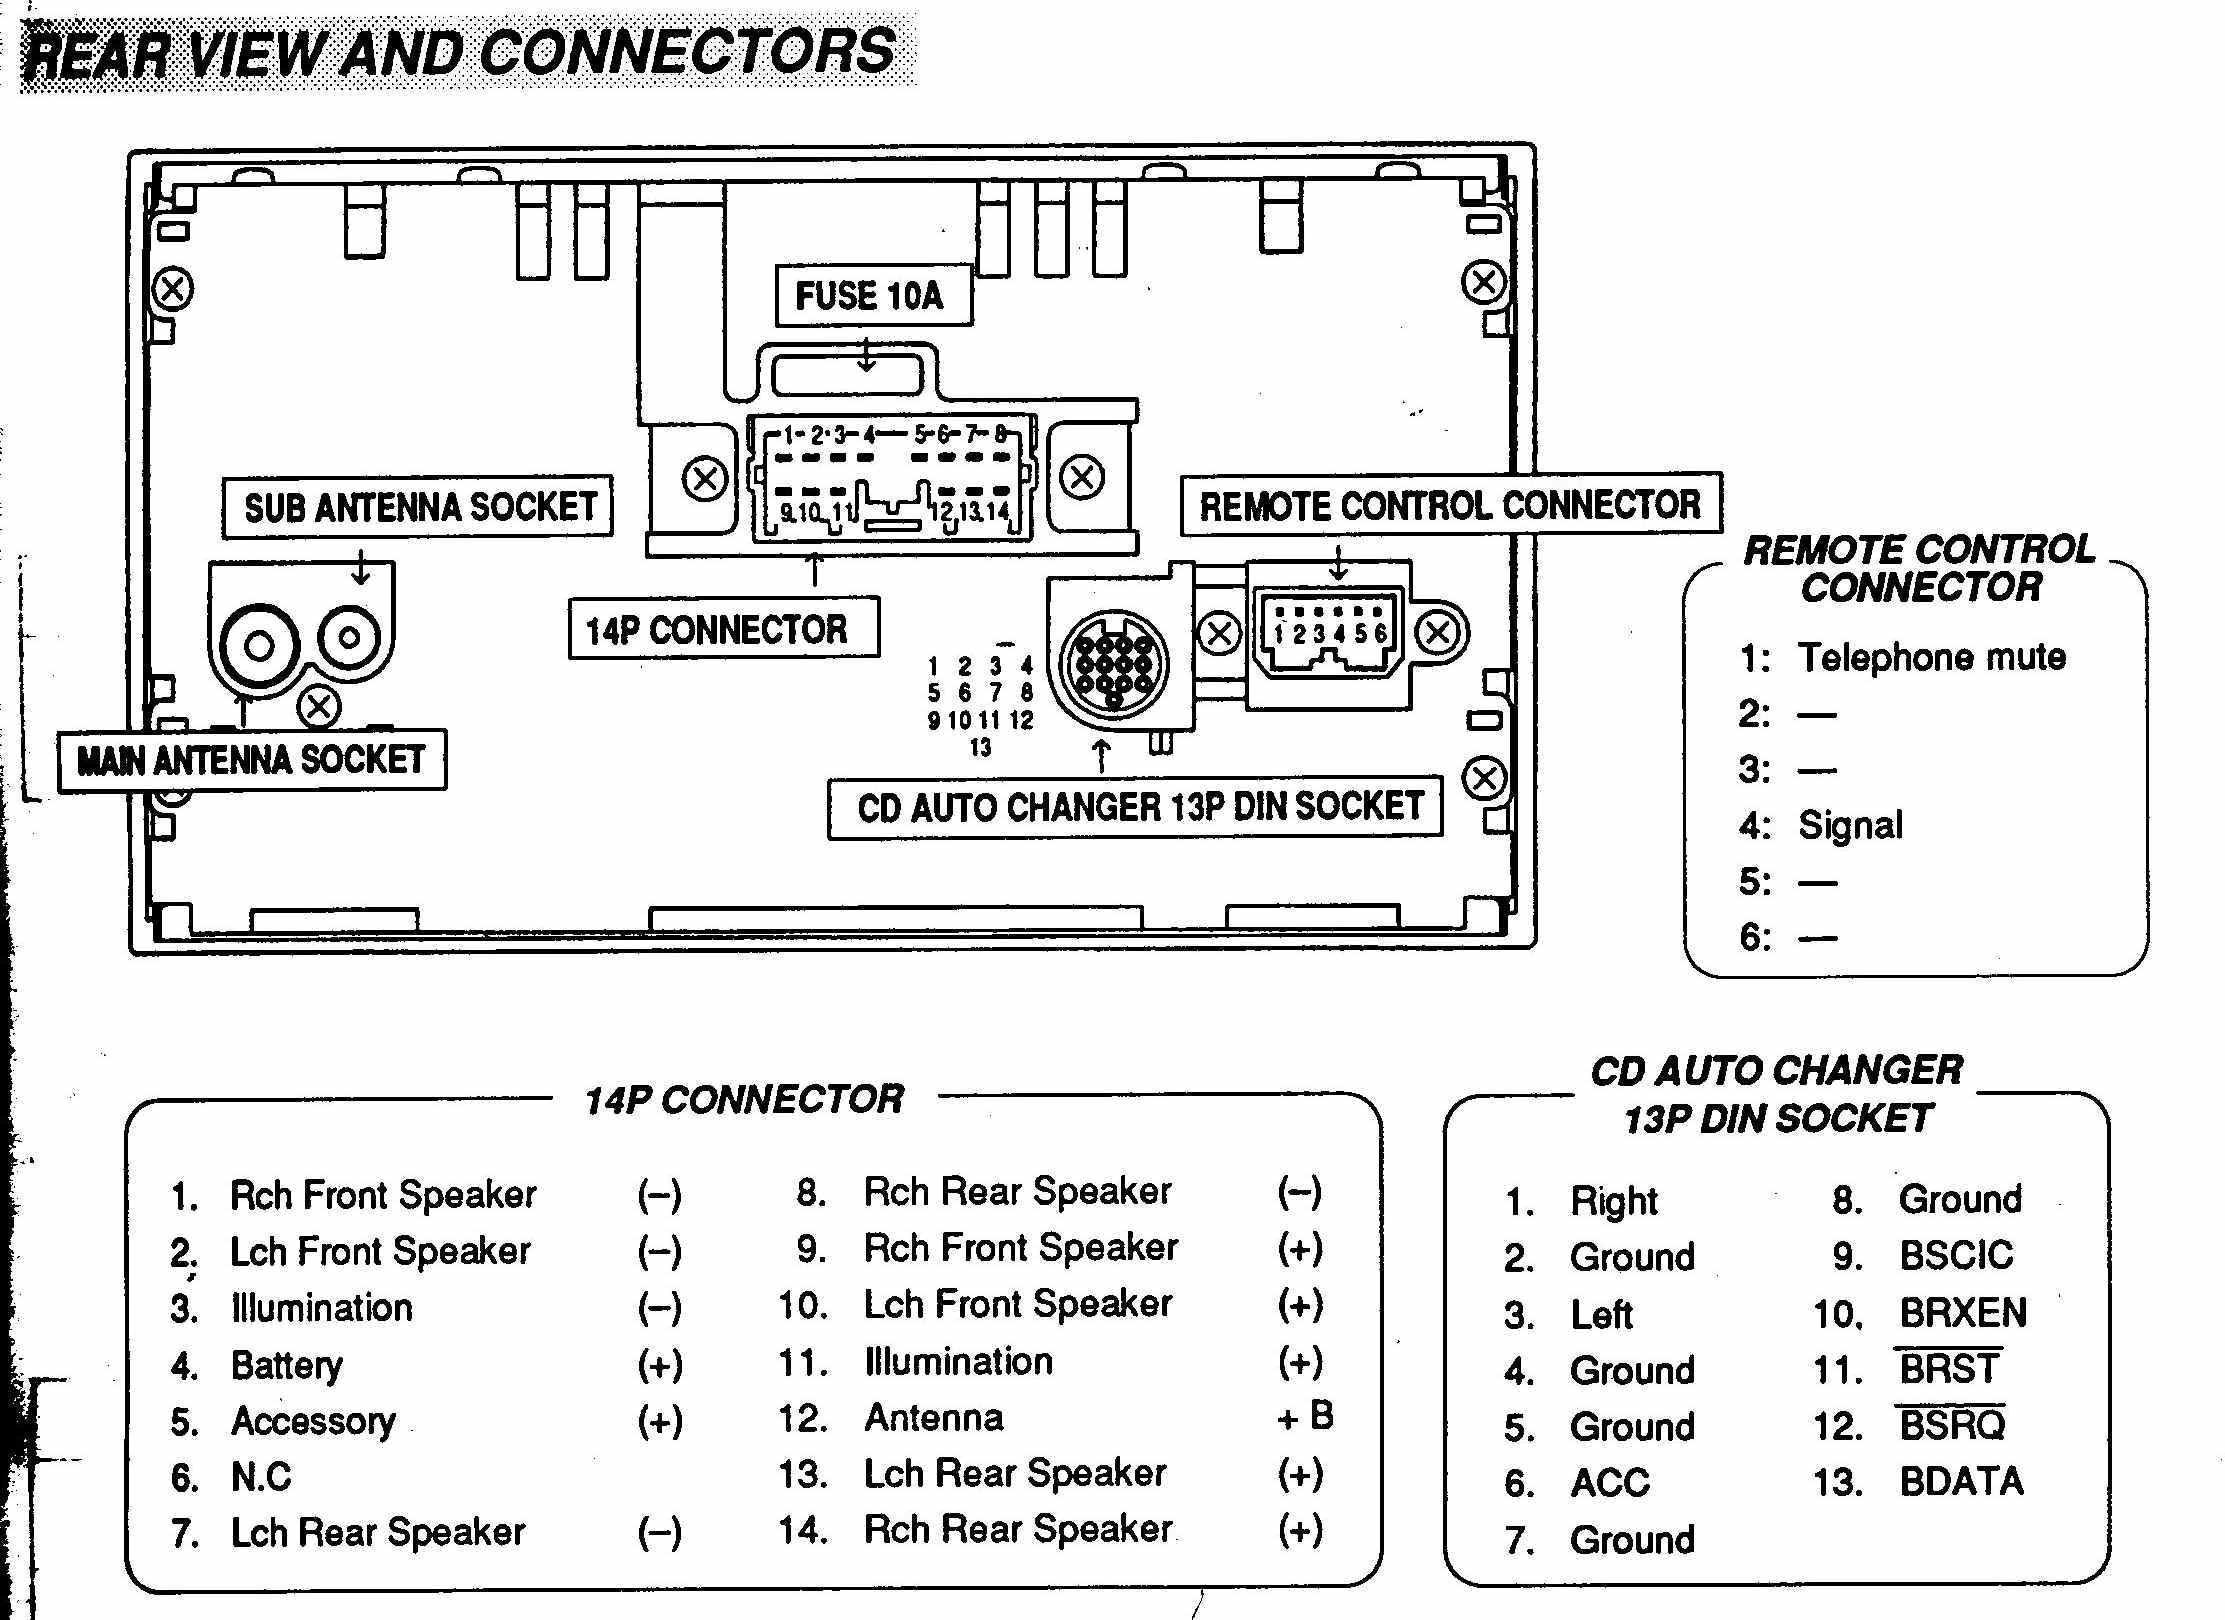 1999 Toyota Camry Radio Wiring Diagram from detoxicrecenze.com